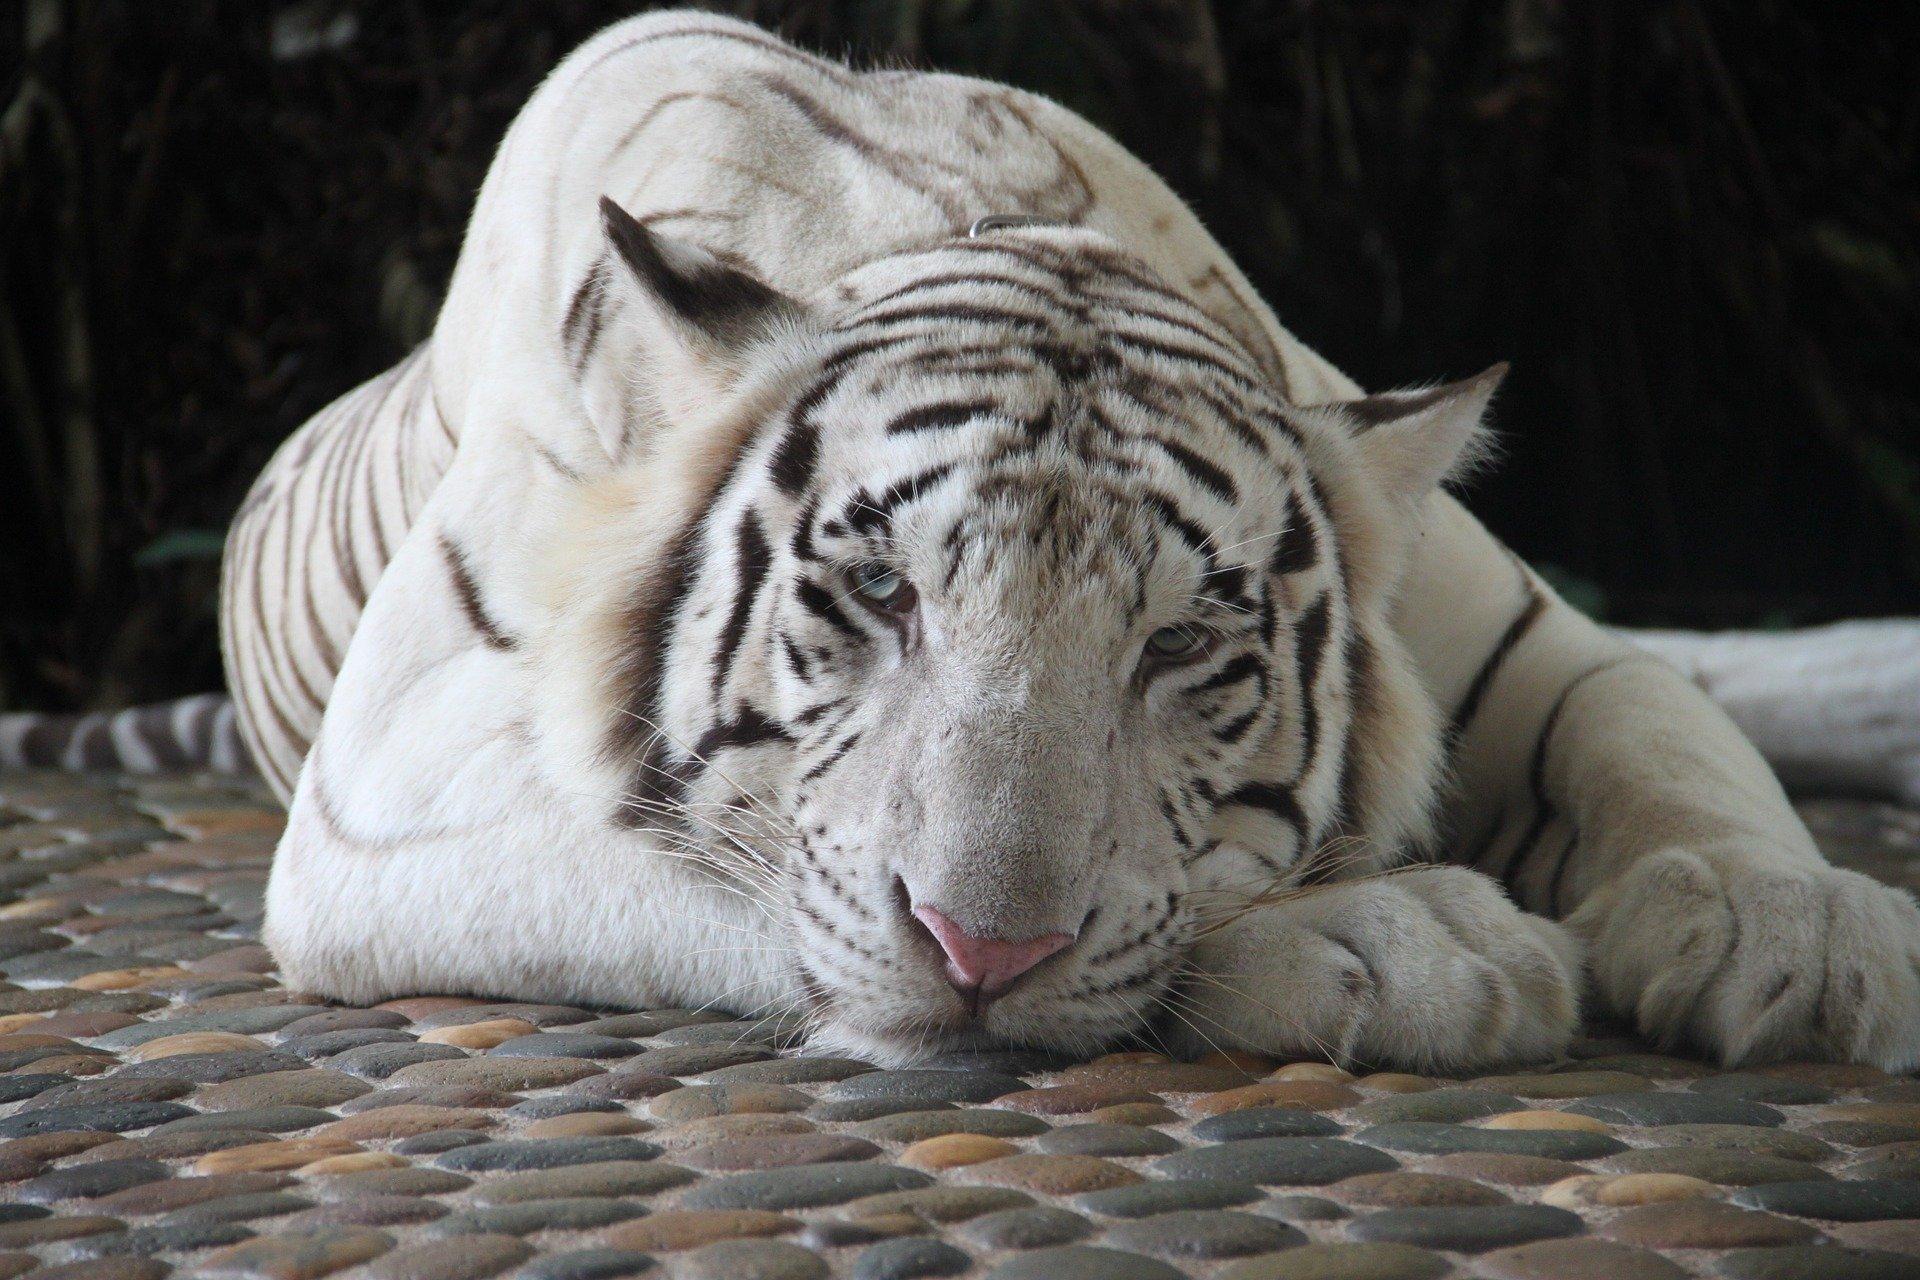 tigre blanco tumbado sobre piedra